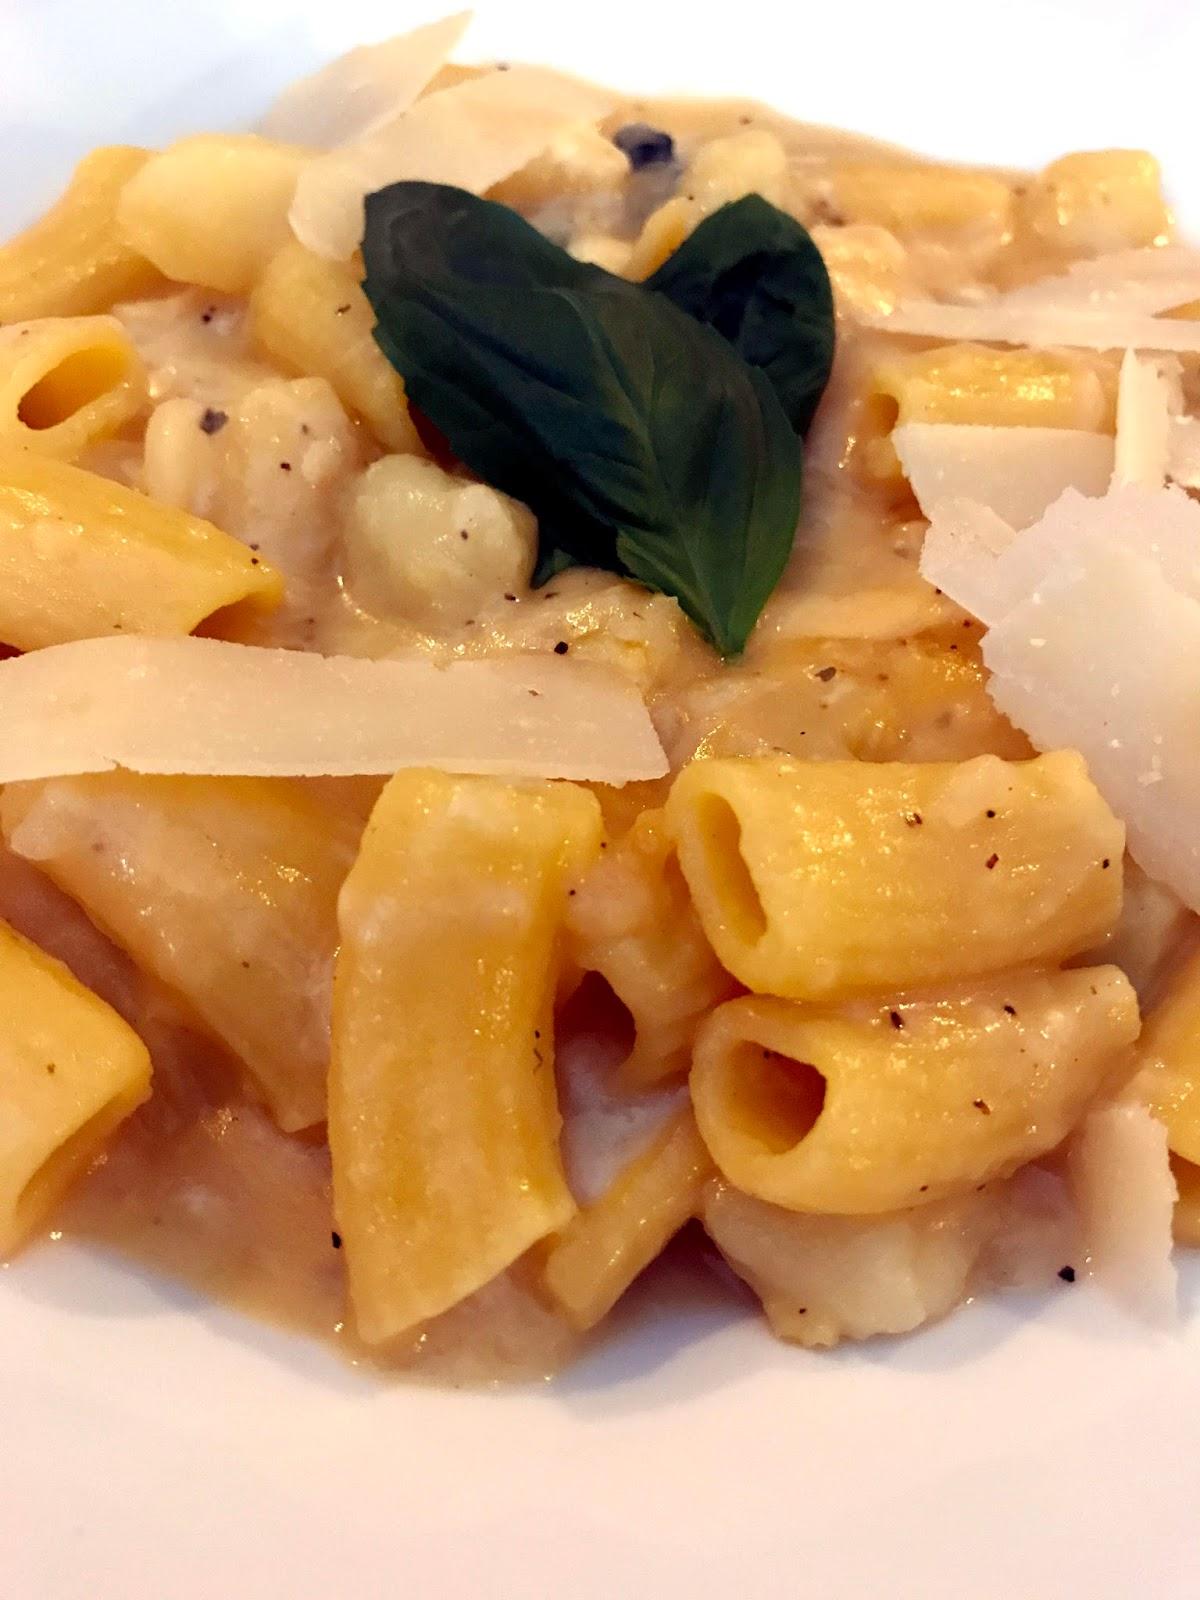 Stitch & Bear - Caffe Amore - Pasta patate e Provola